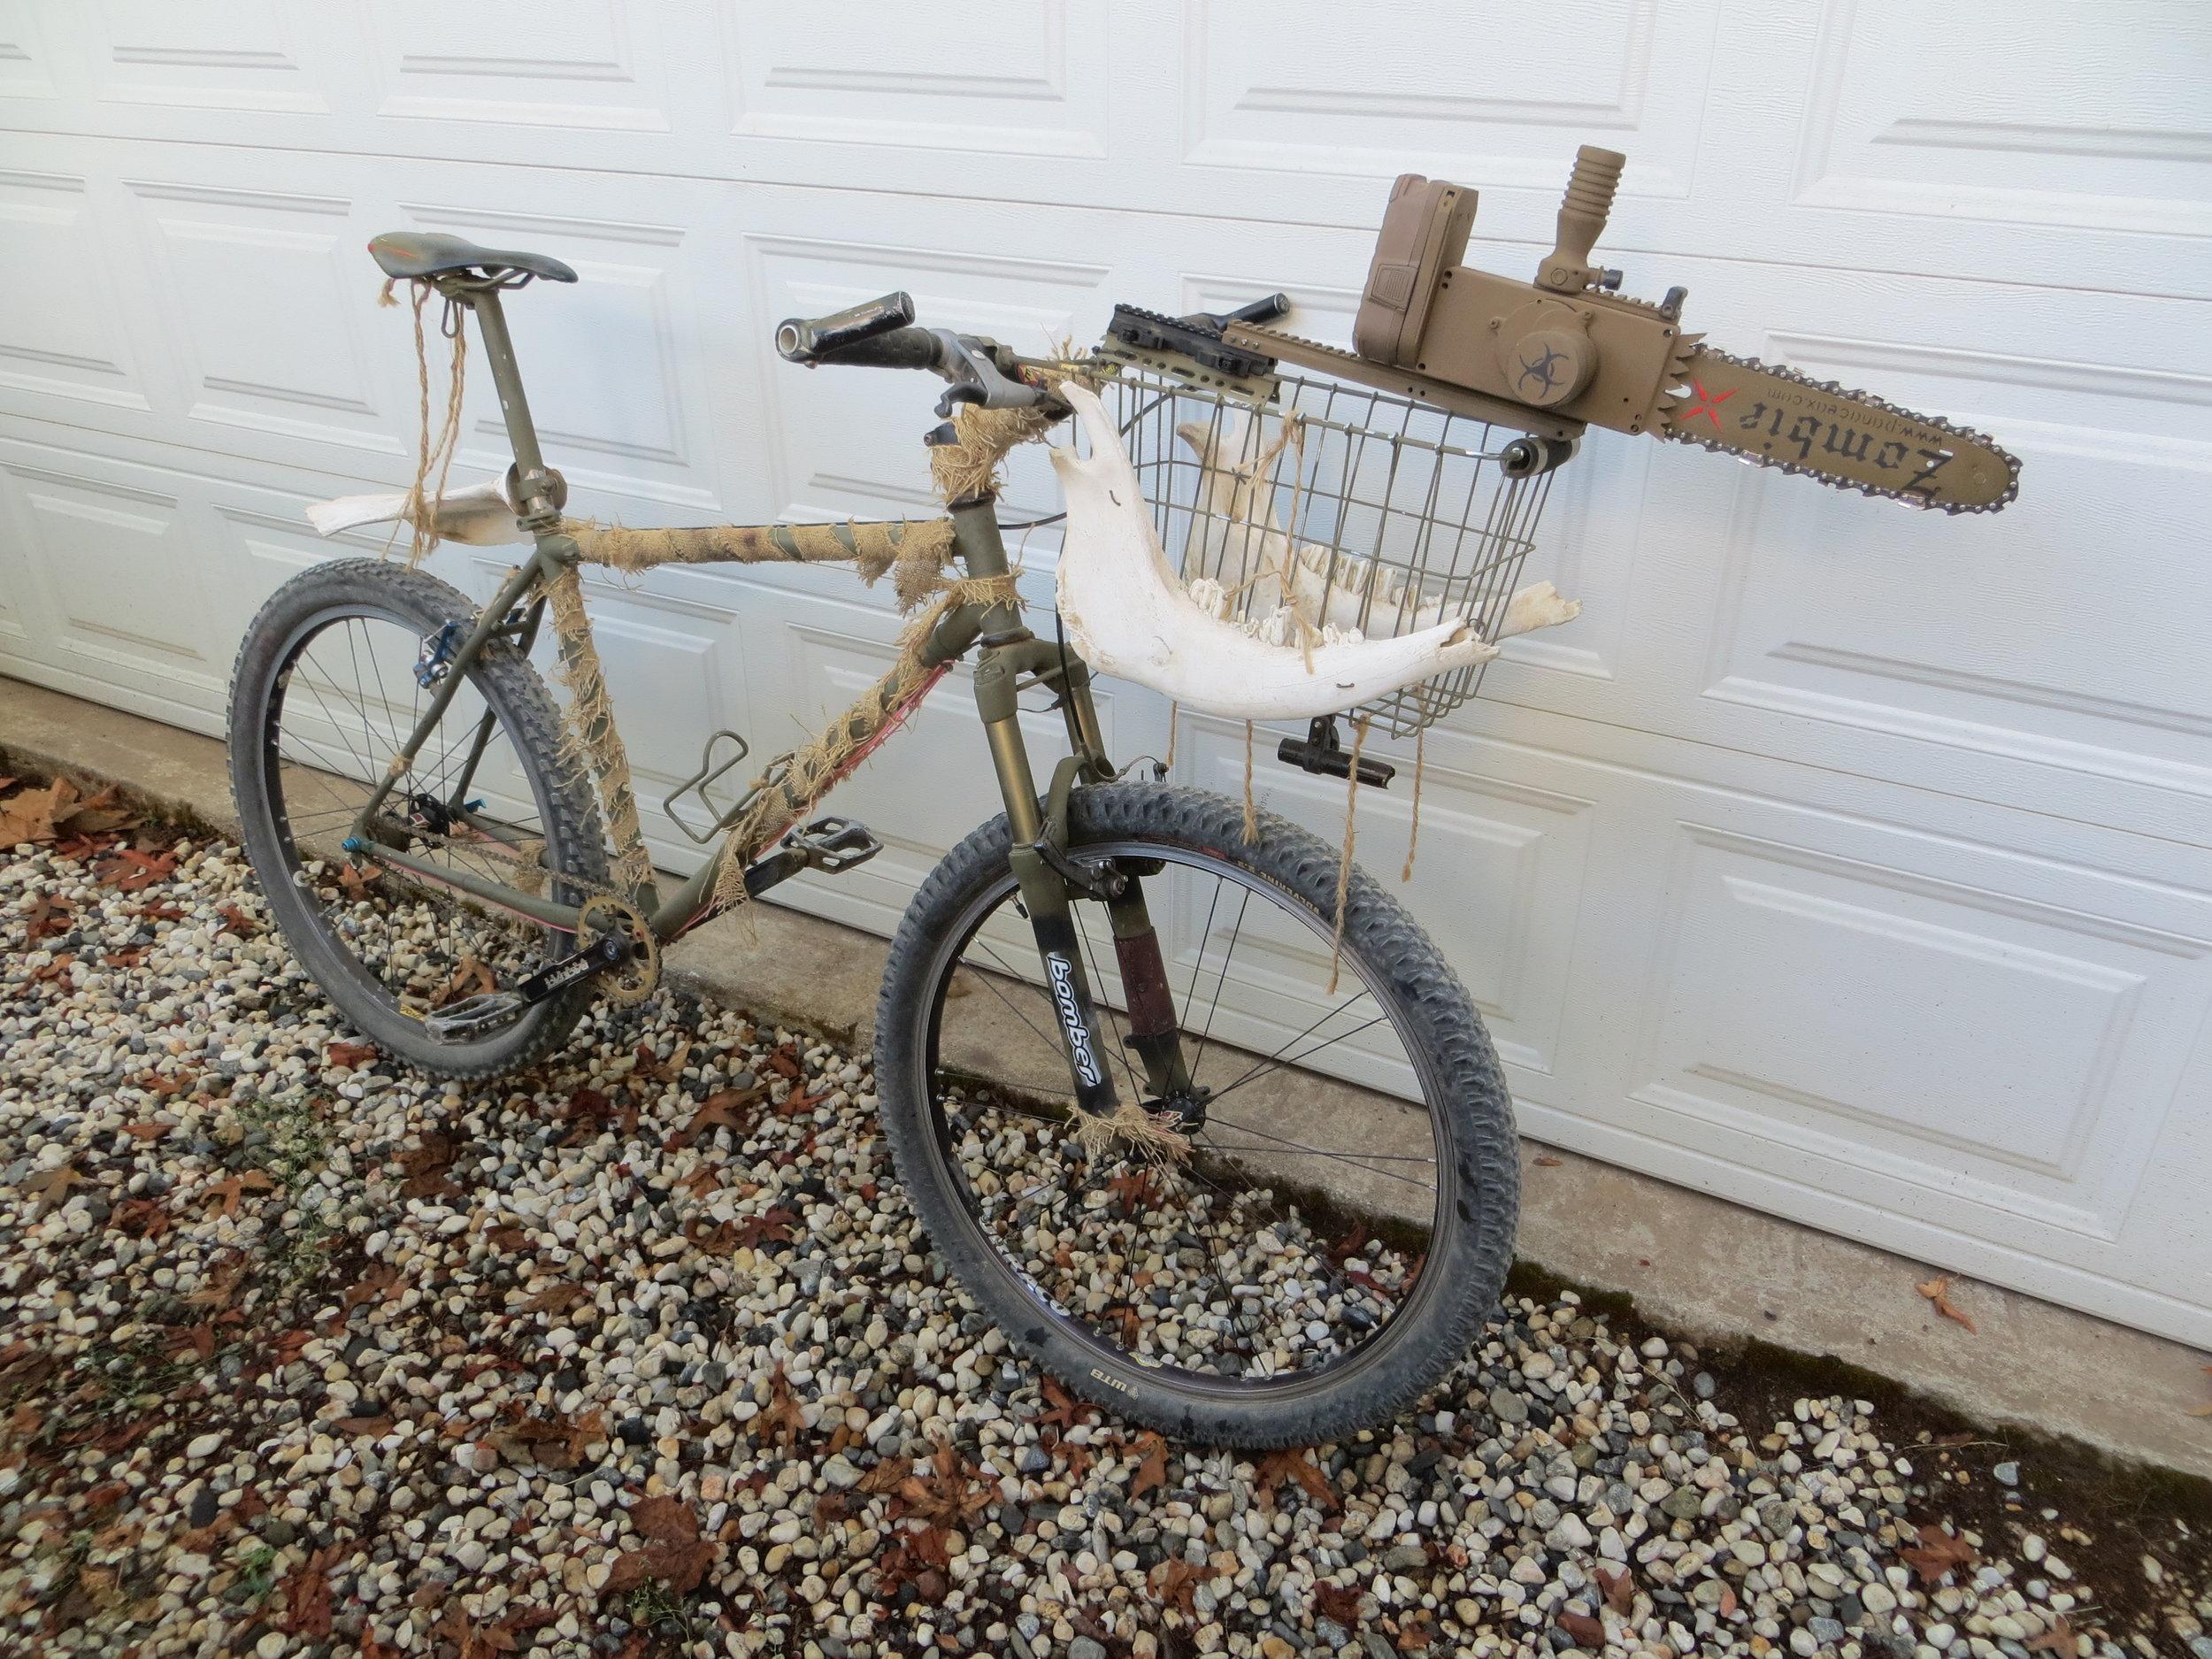 Panacea X, X tribe bike